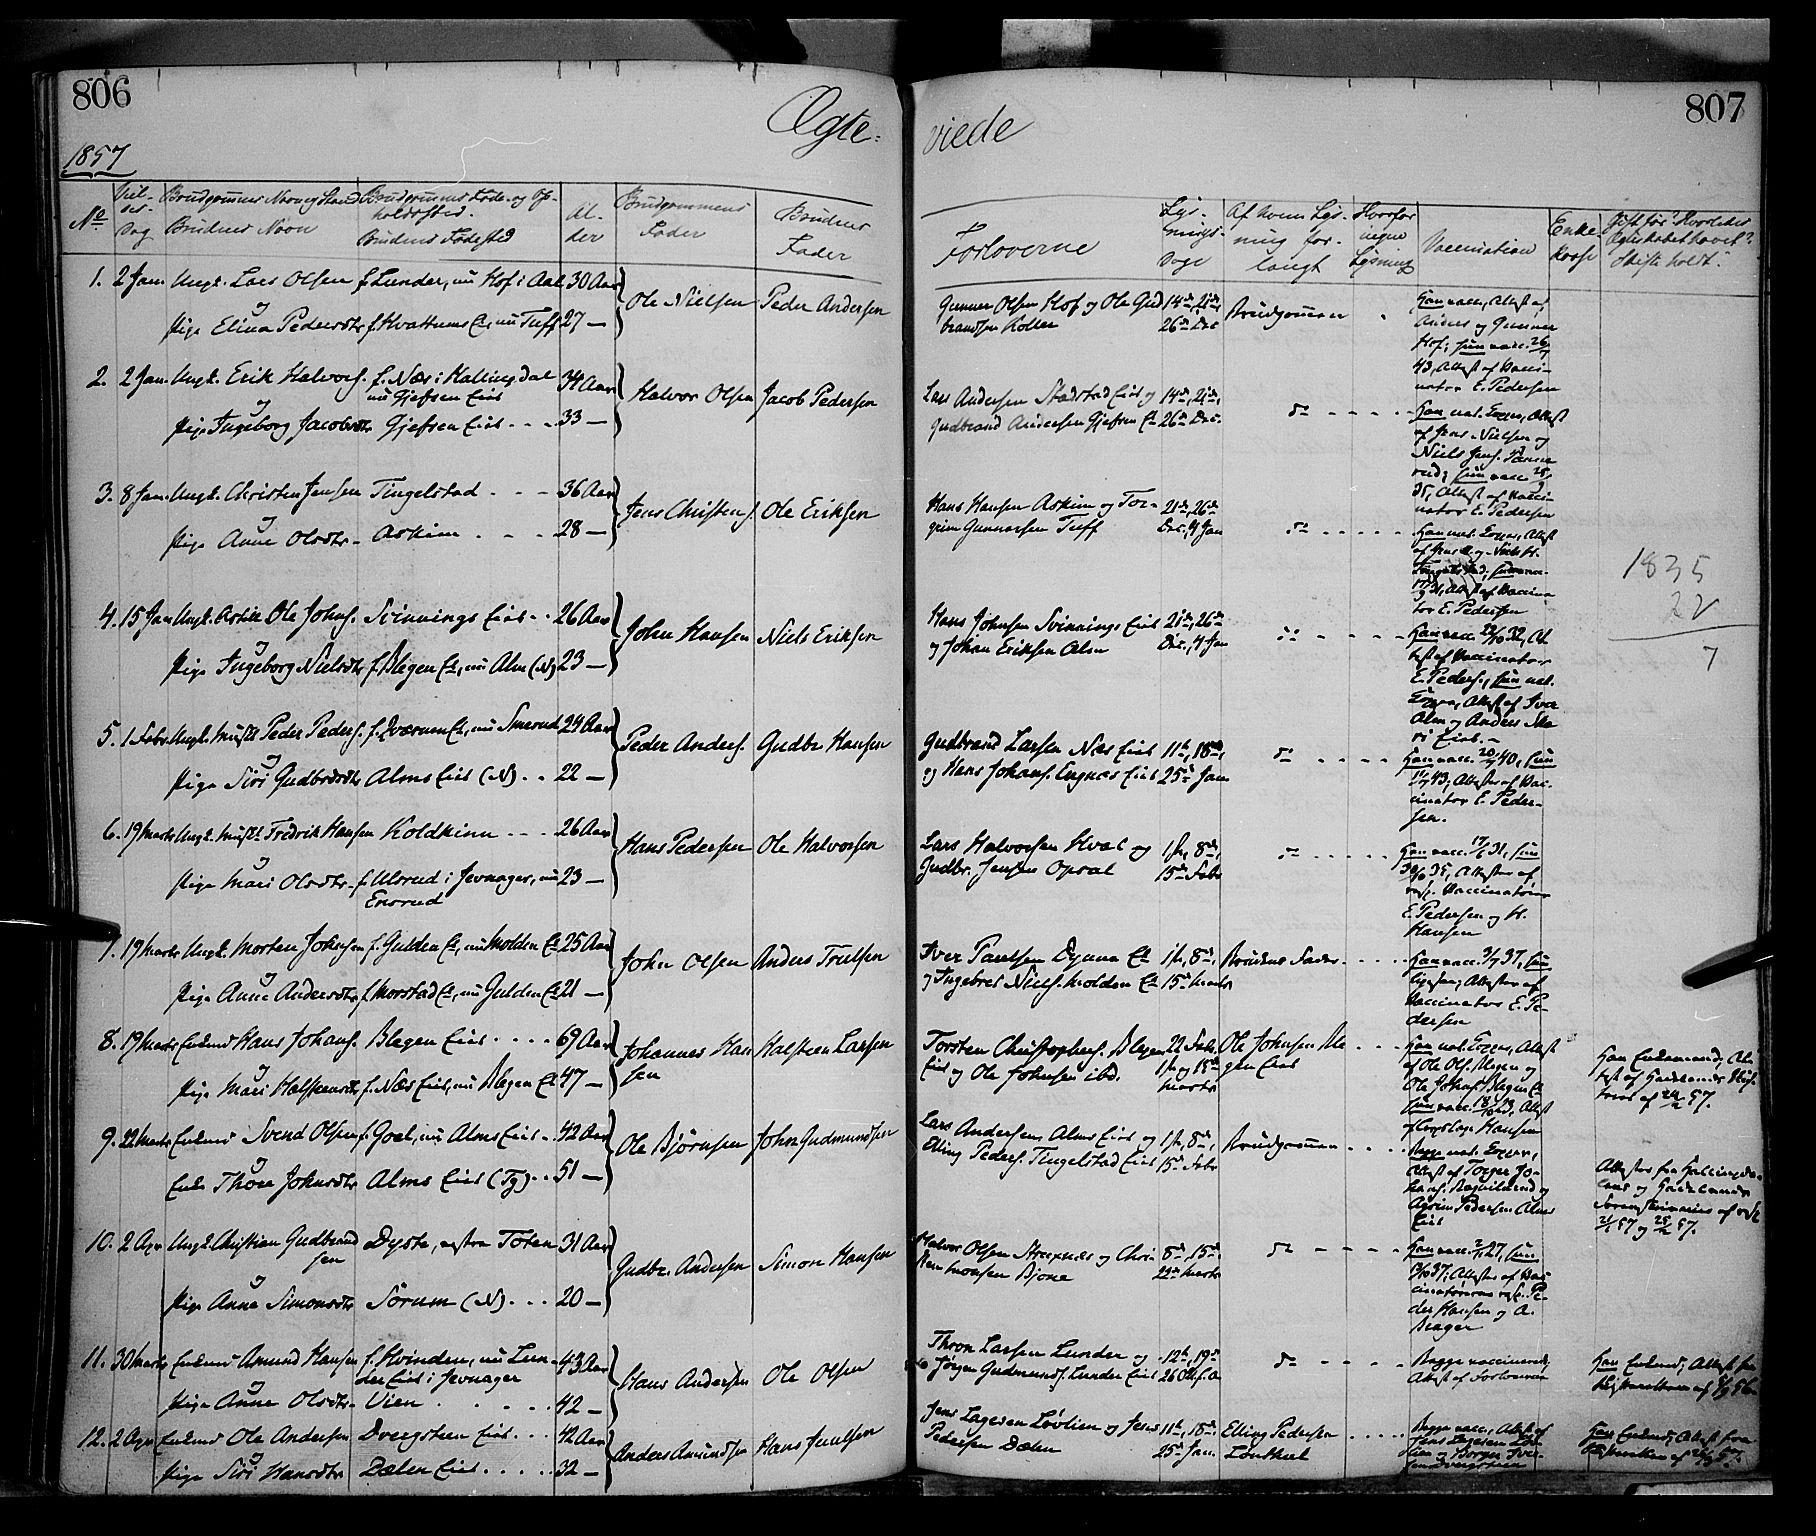 SAH, Gran prestekontor, Ministerialbok nr. 12, 1856-1874, s. 806-807